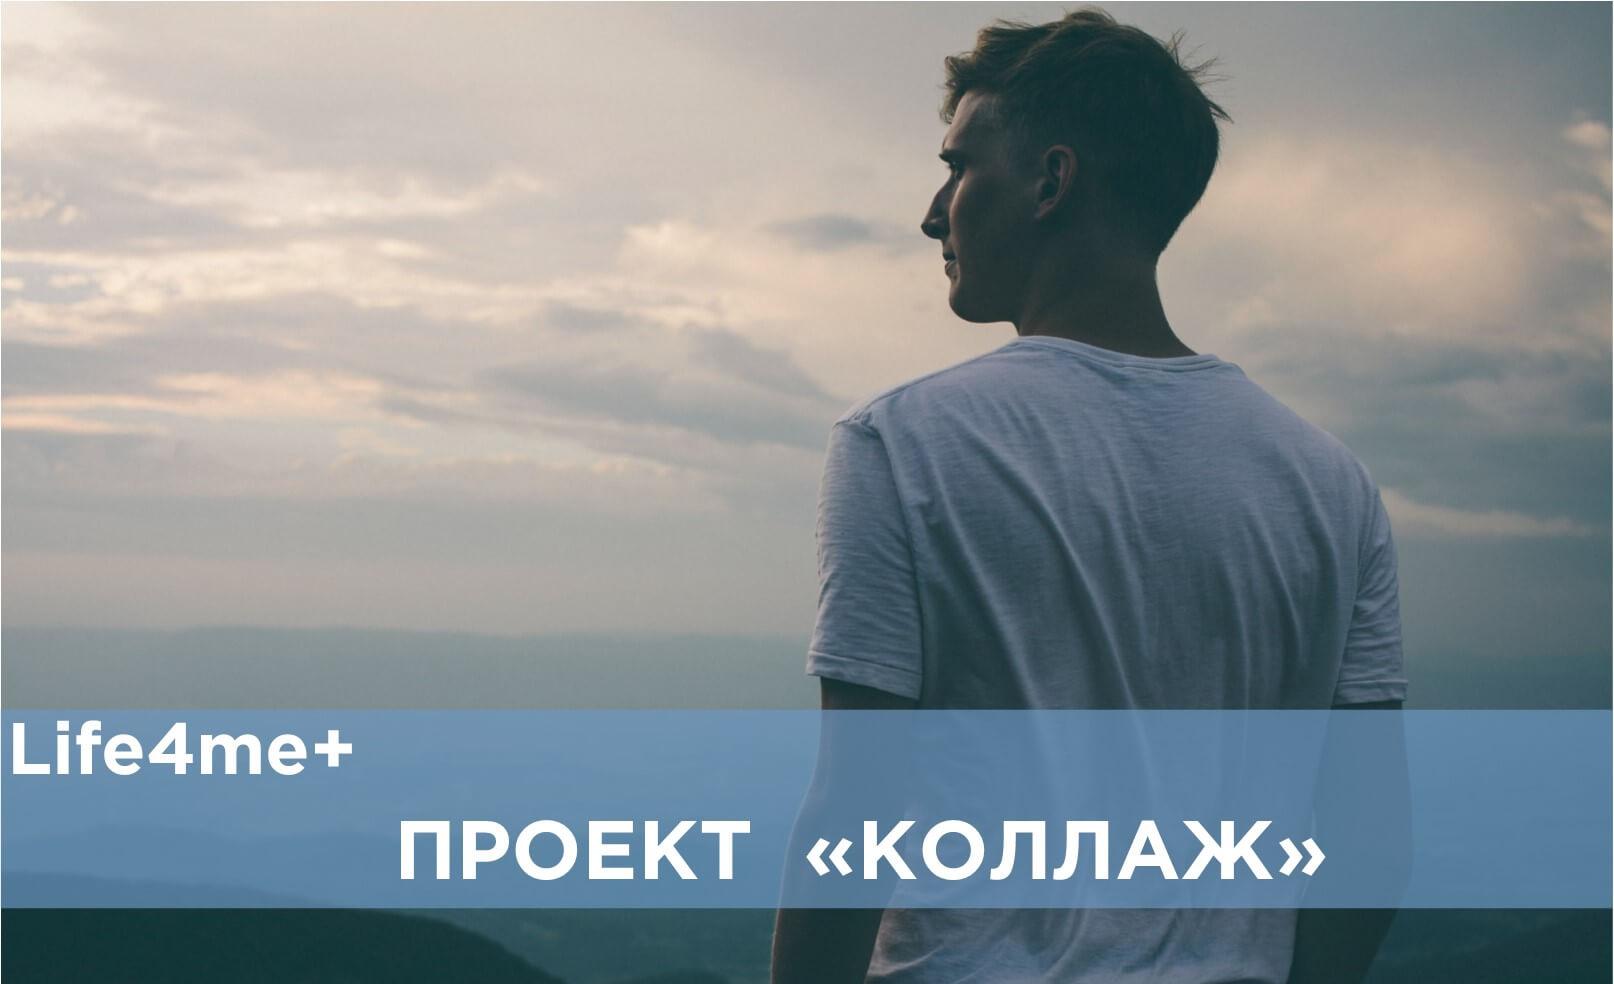 "Коллаж: ""Я столкнулся с дискриминацией среди ЛЖВ"", - Юрий «Vichevoi»"